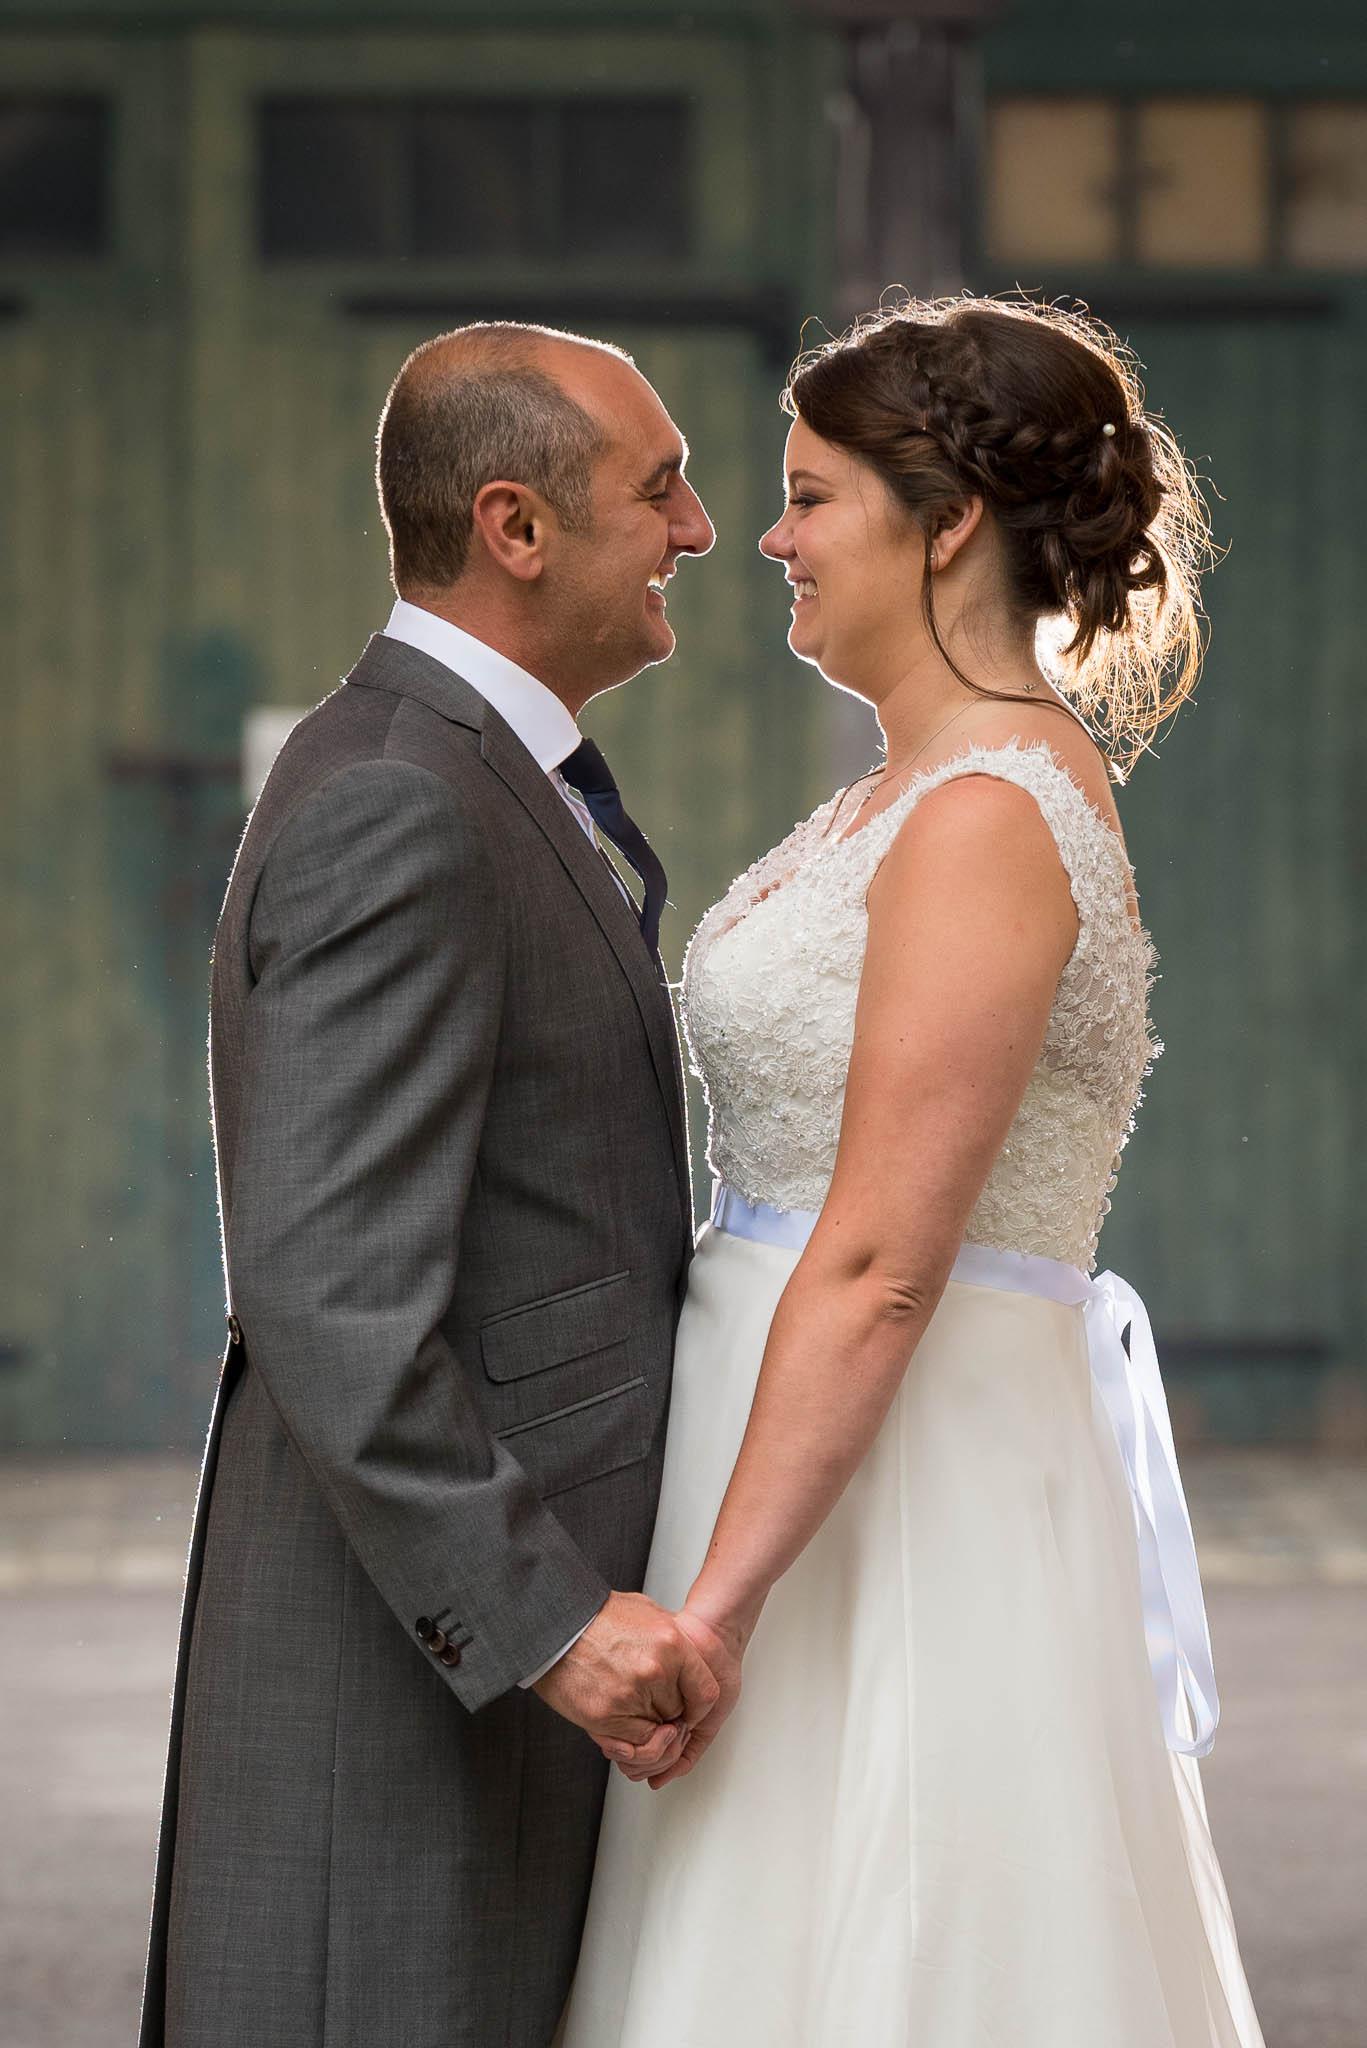 Crathorne Hall Hotel Wedding Photographer86.jpg